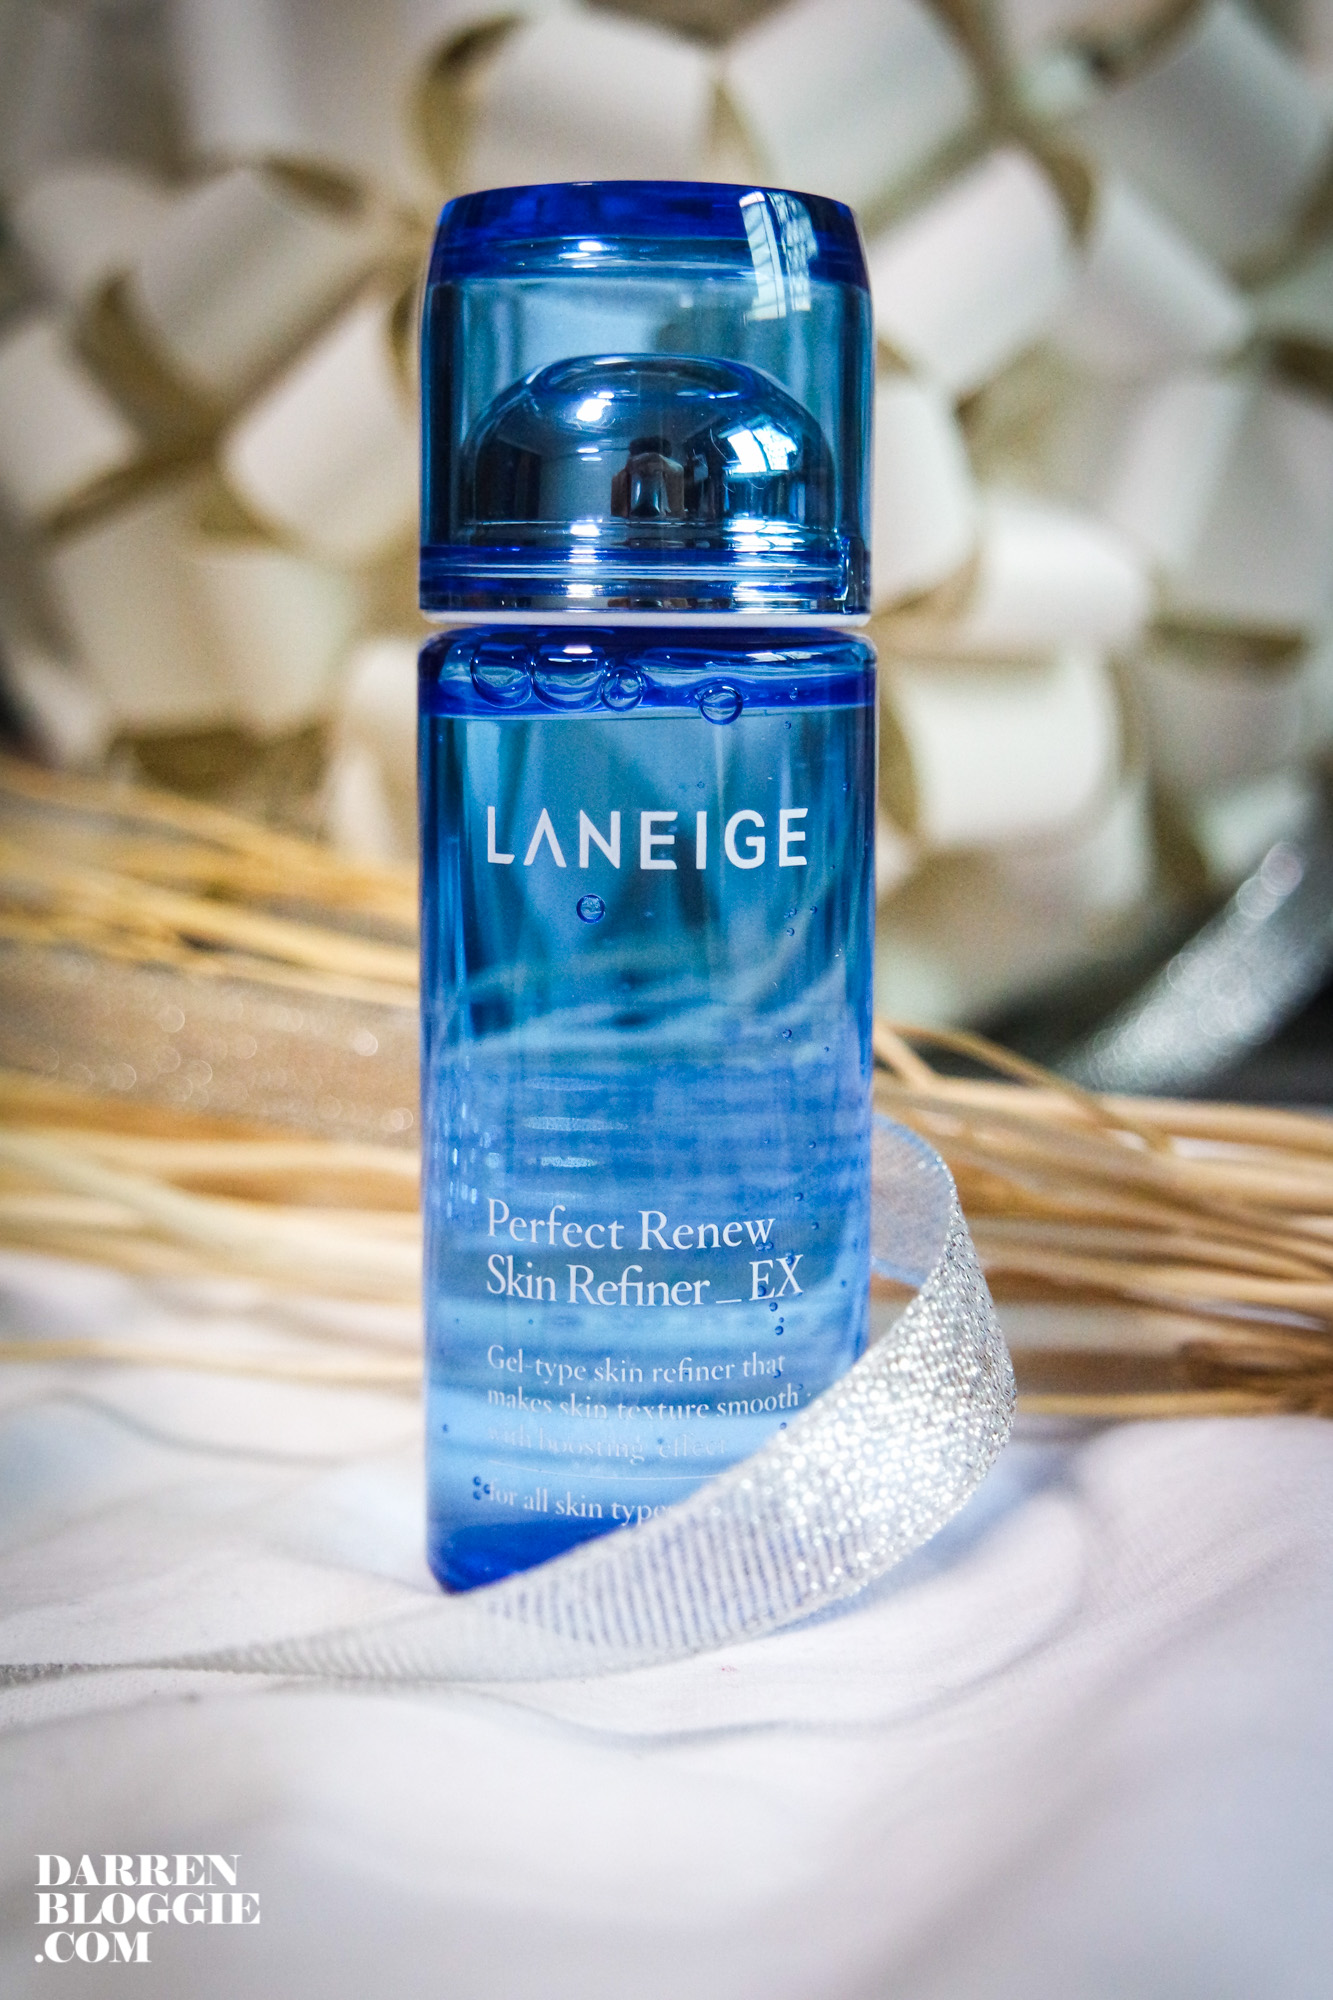 laneige_luxora_luxenomad-8024